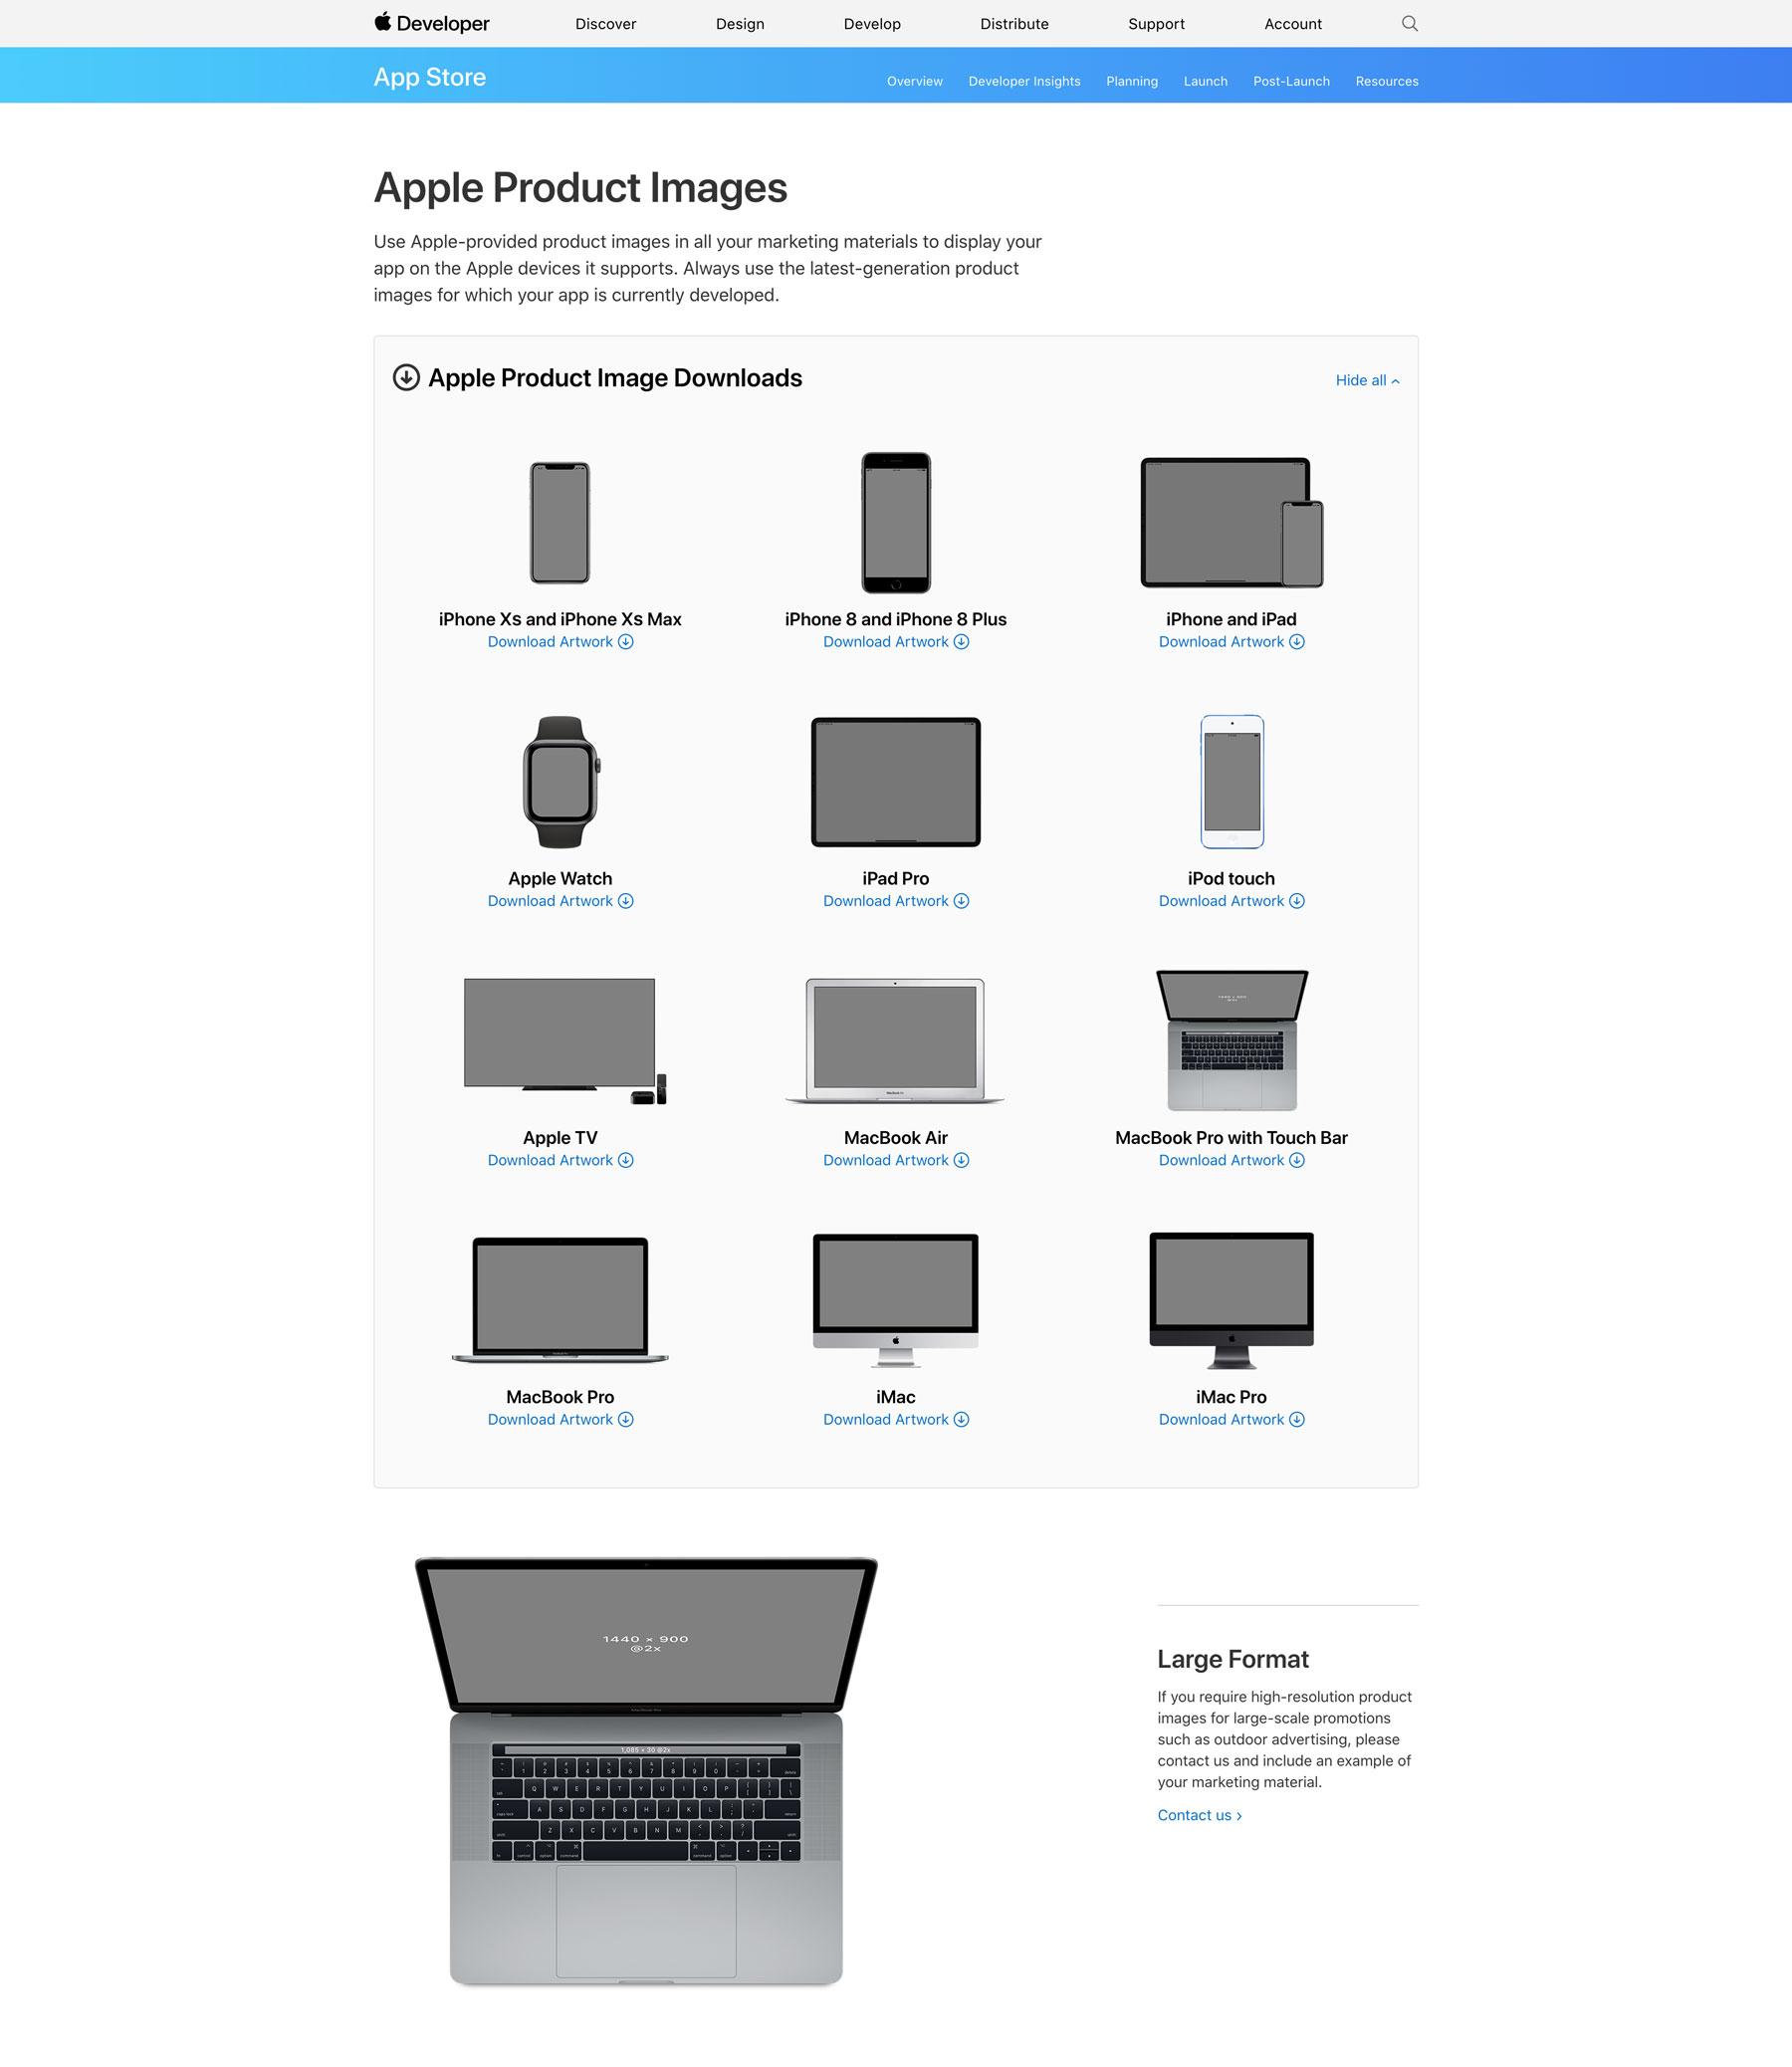 Apple Marketing Resources Screenshot